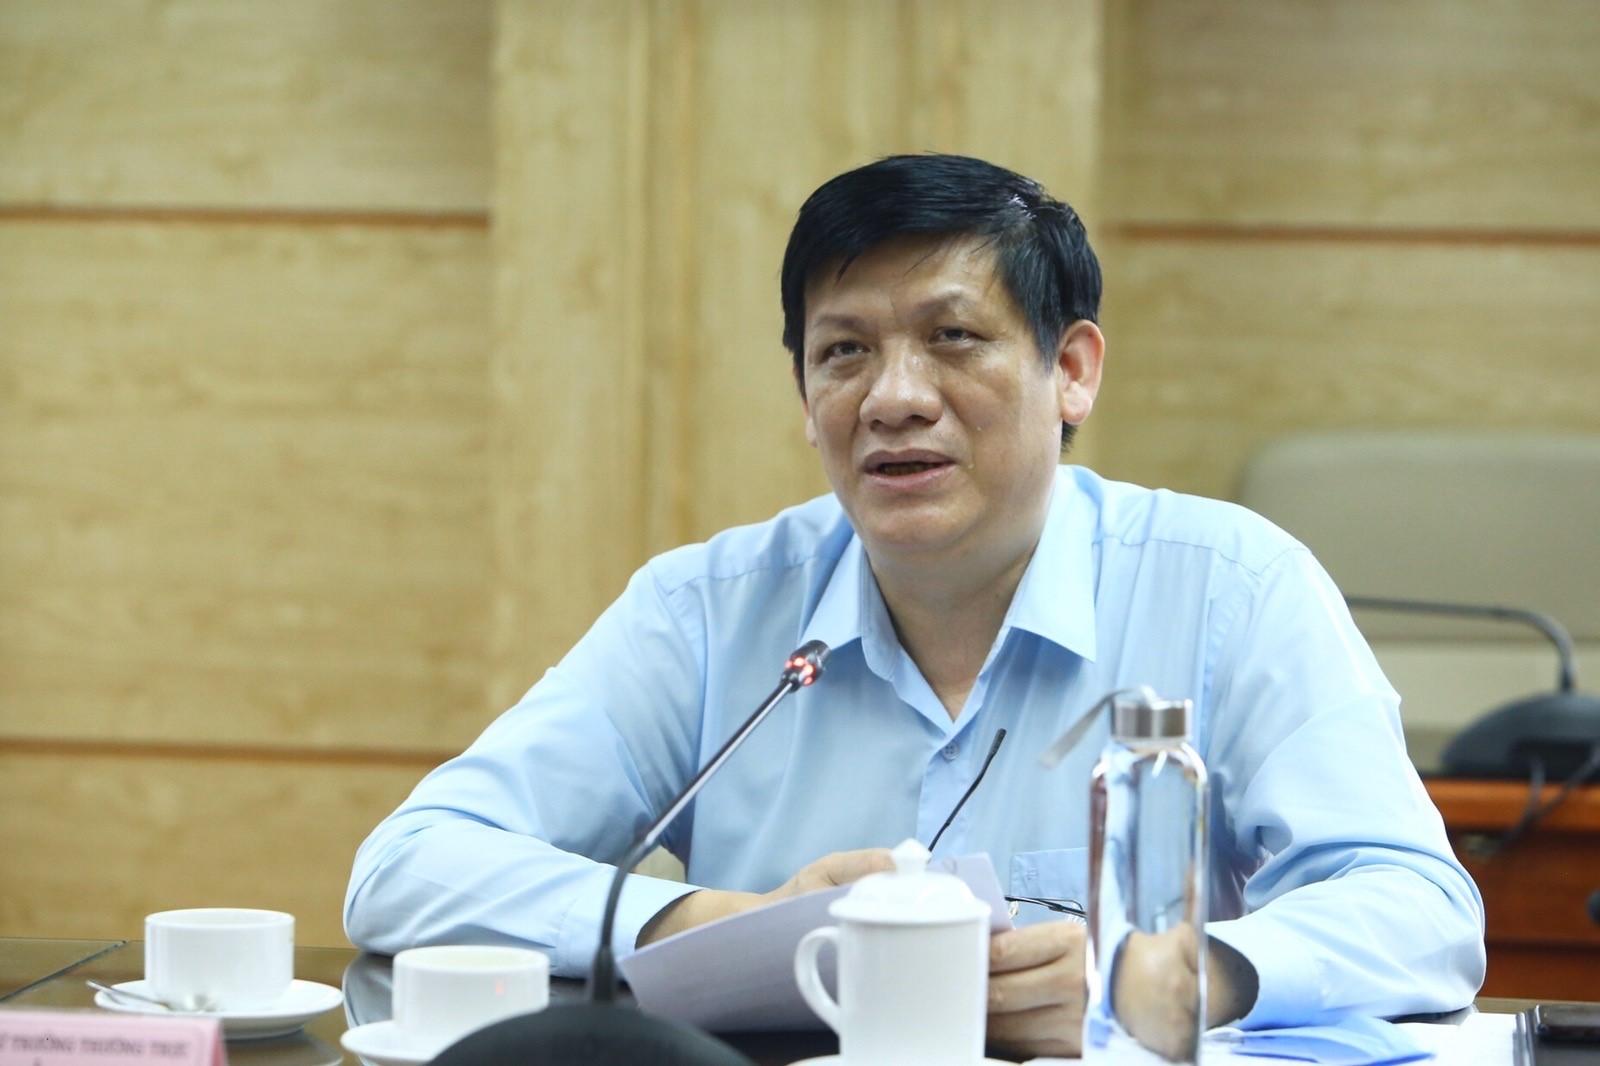 Vietnam MOH Deputy Minister